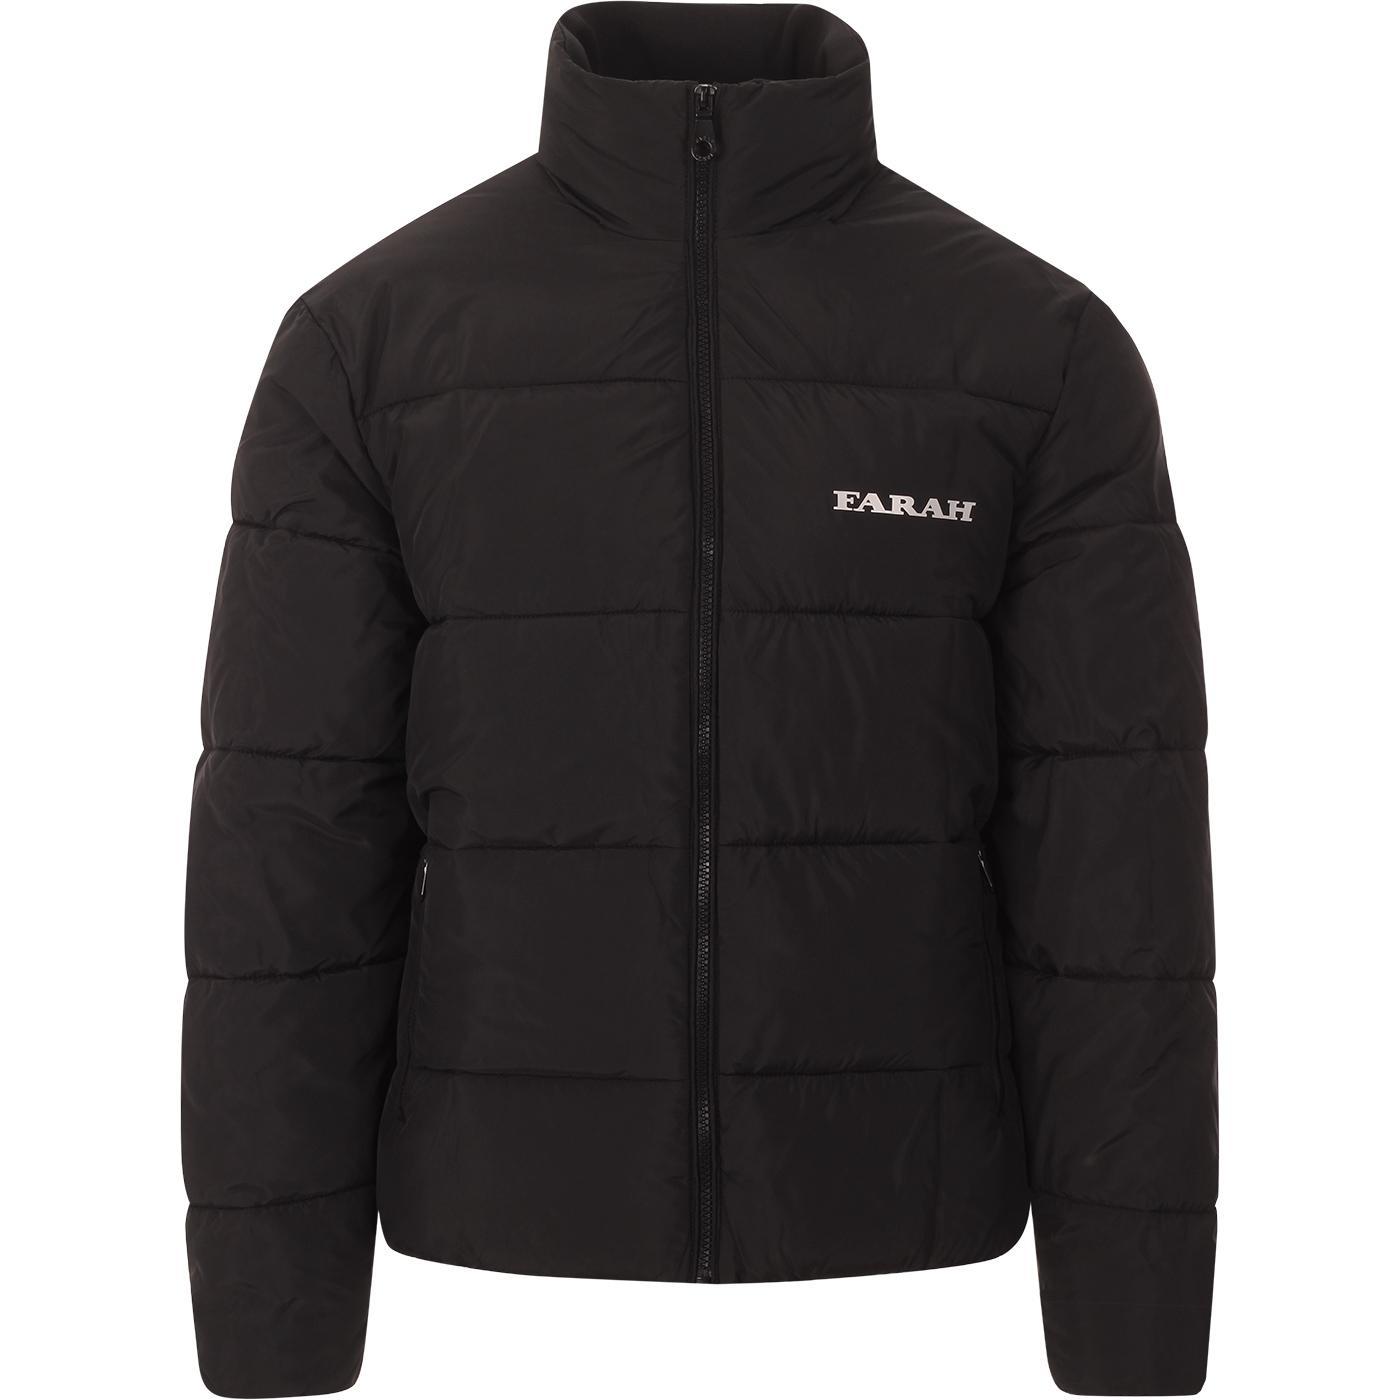 Dwight FARAH Retro Archive Wadded Coat (Black)